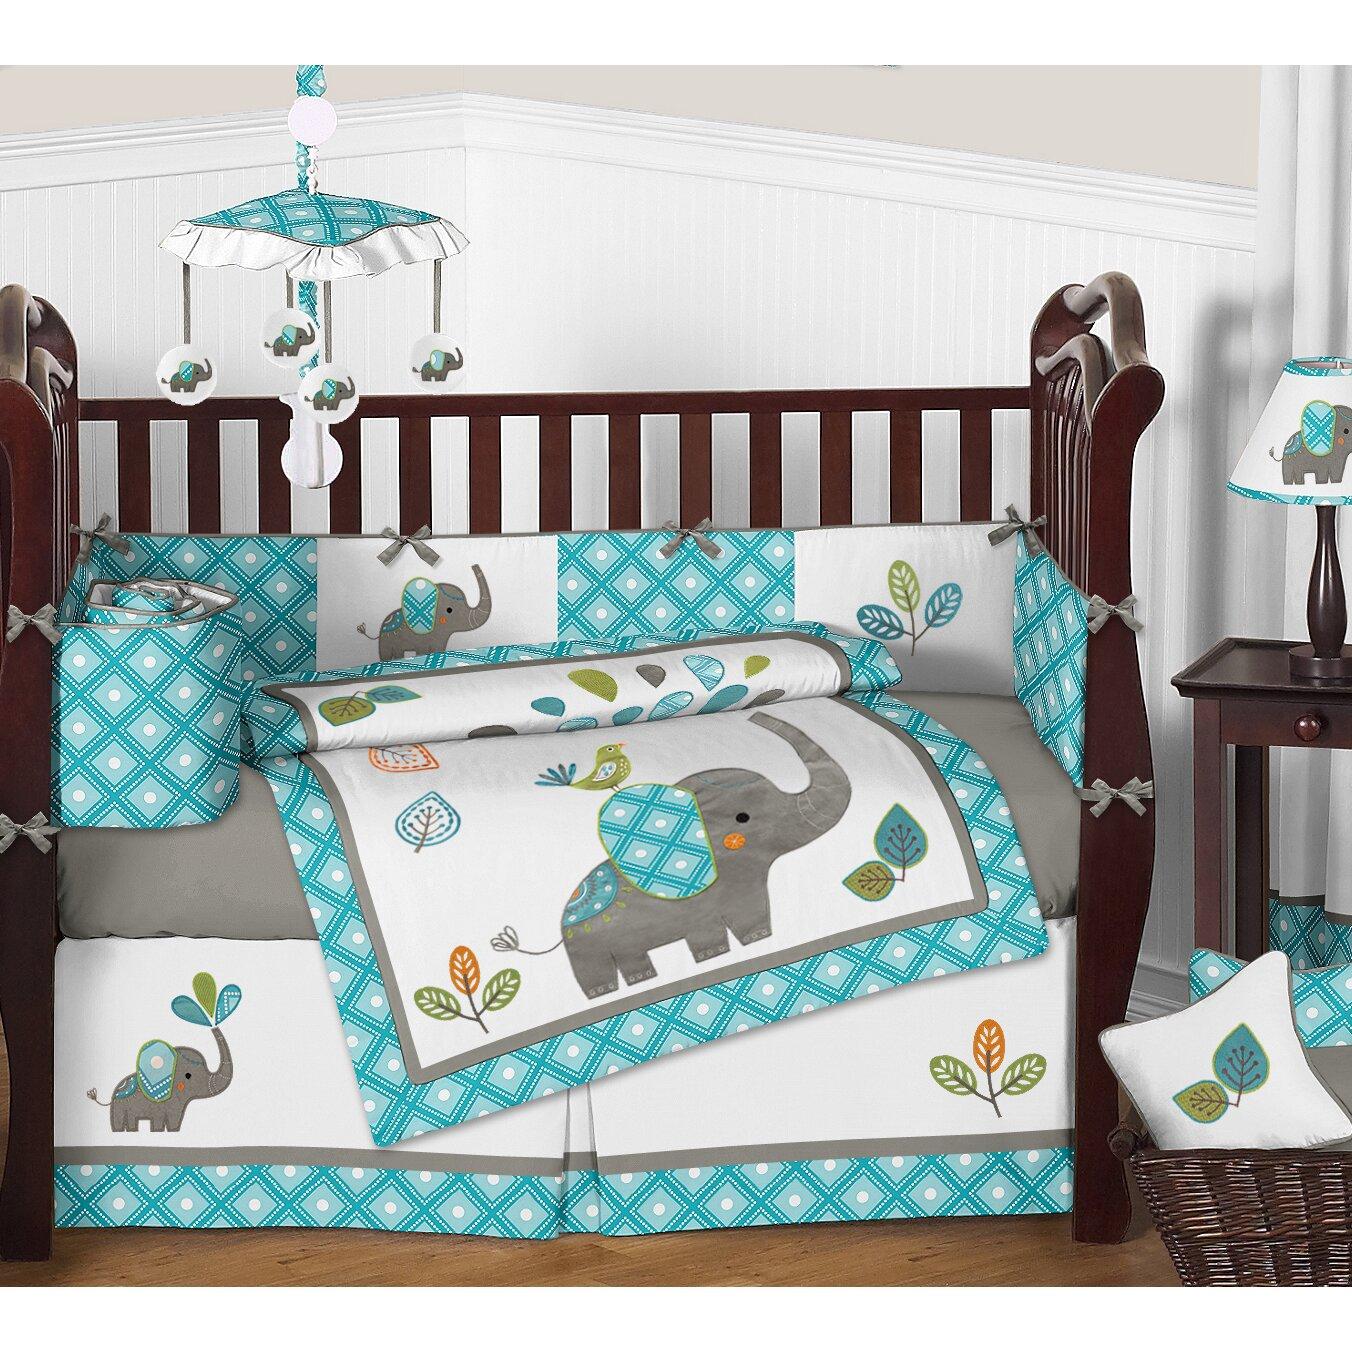 Baby Elephant Crib Bedding Set